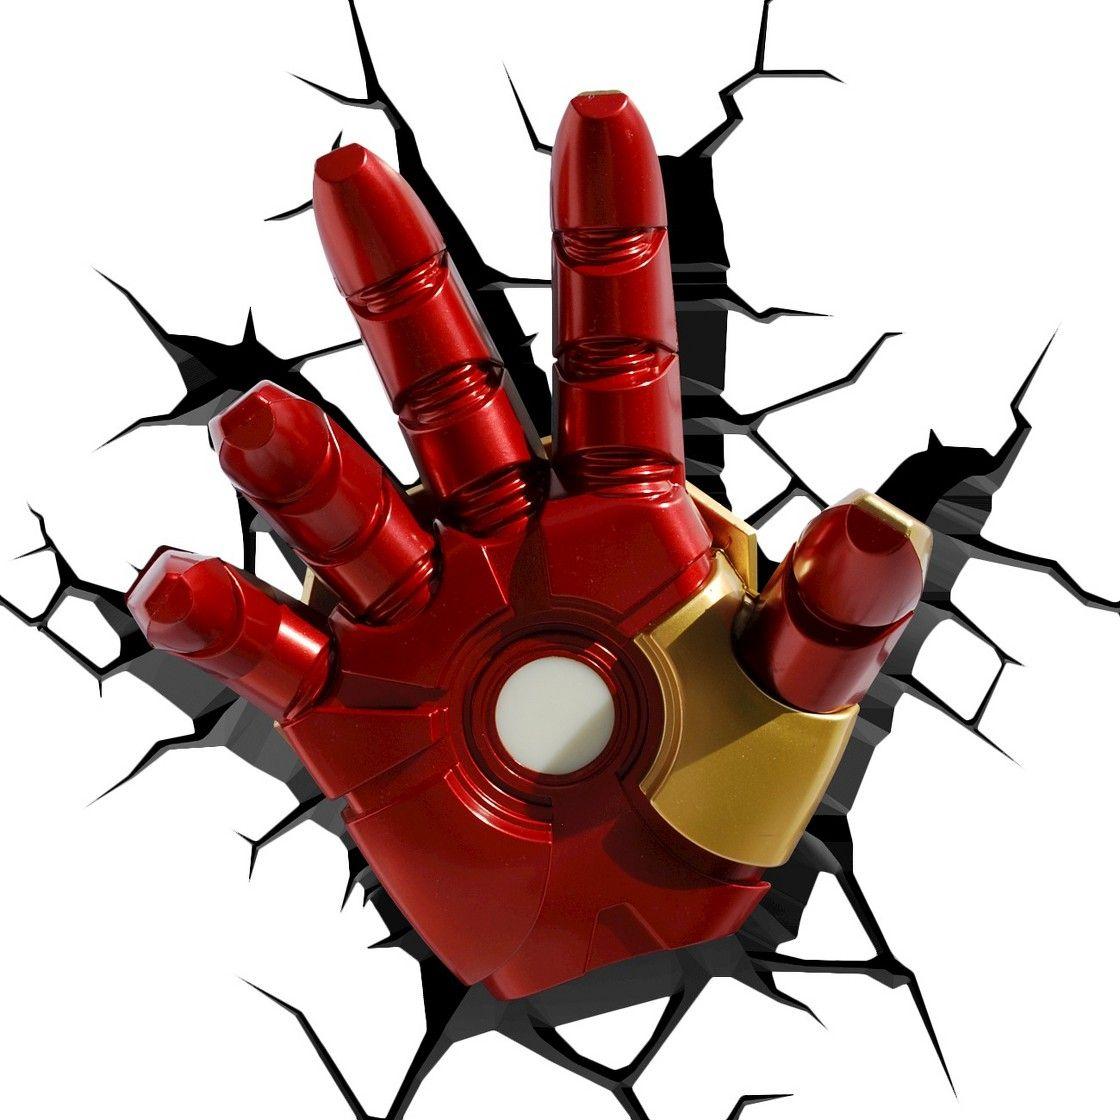 The Avengers 3D Wall Art Nightlight - Iron Man Hand  sc 1 st  Pinterest & The Avengers 3D Wall Art Nightlight - Iron Man Hand | Birthdays ...